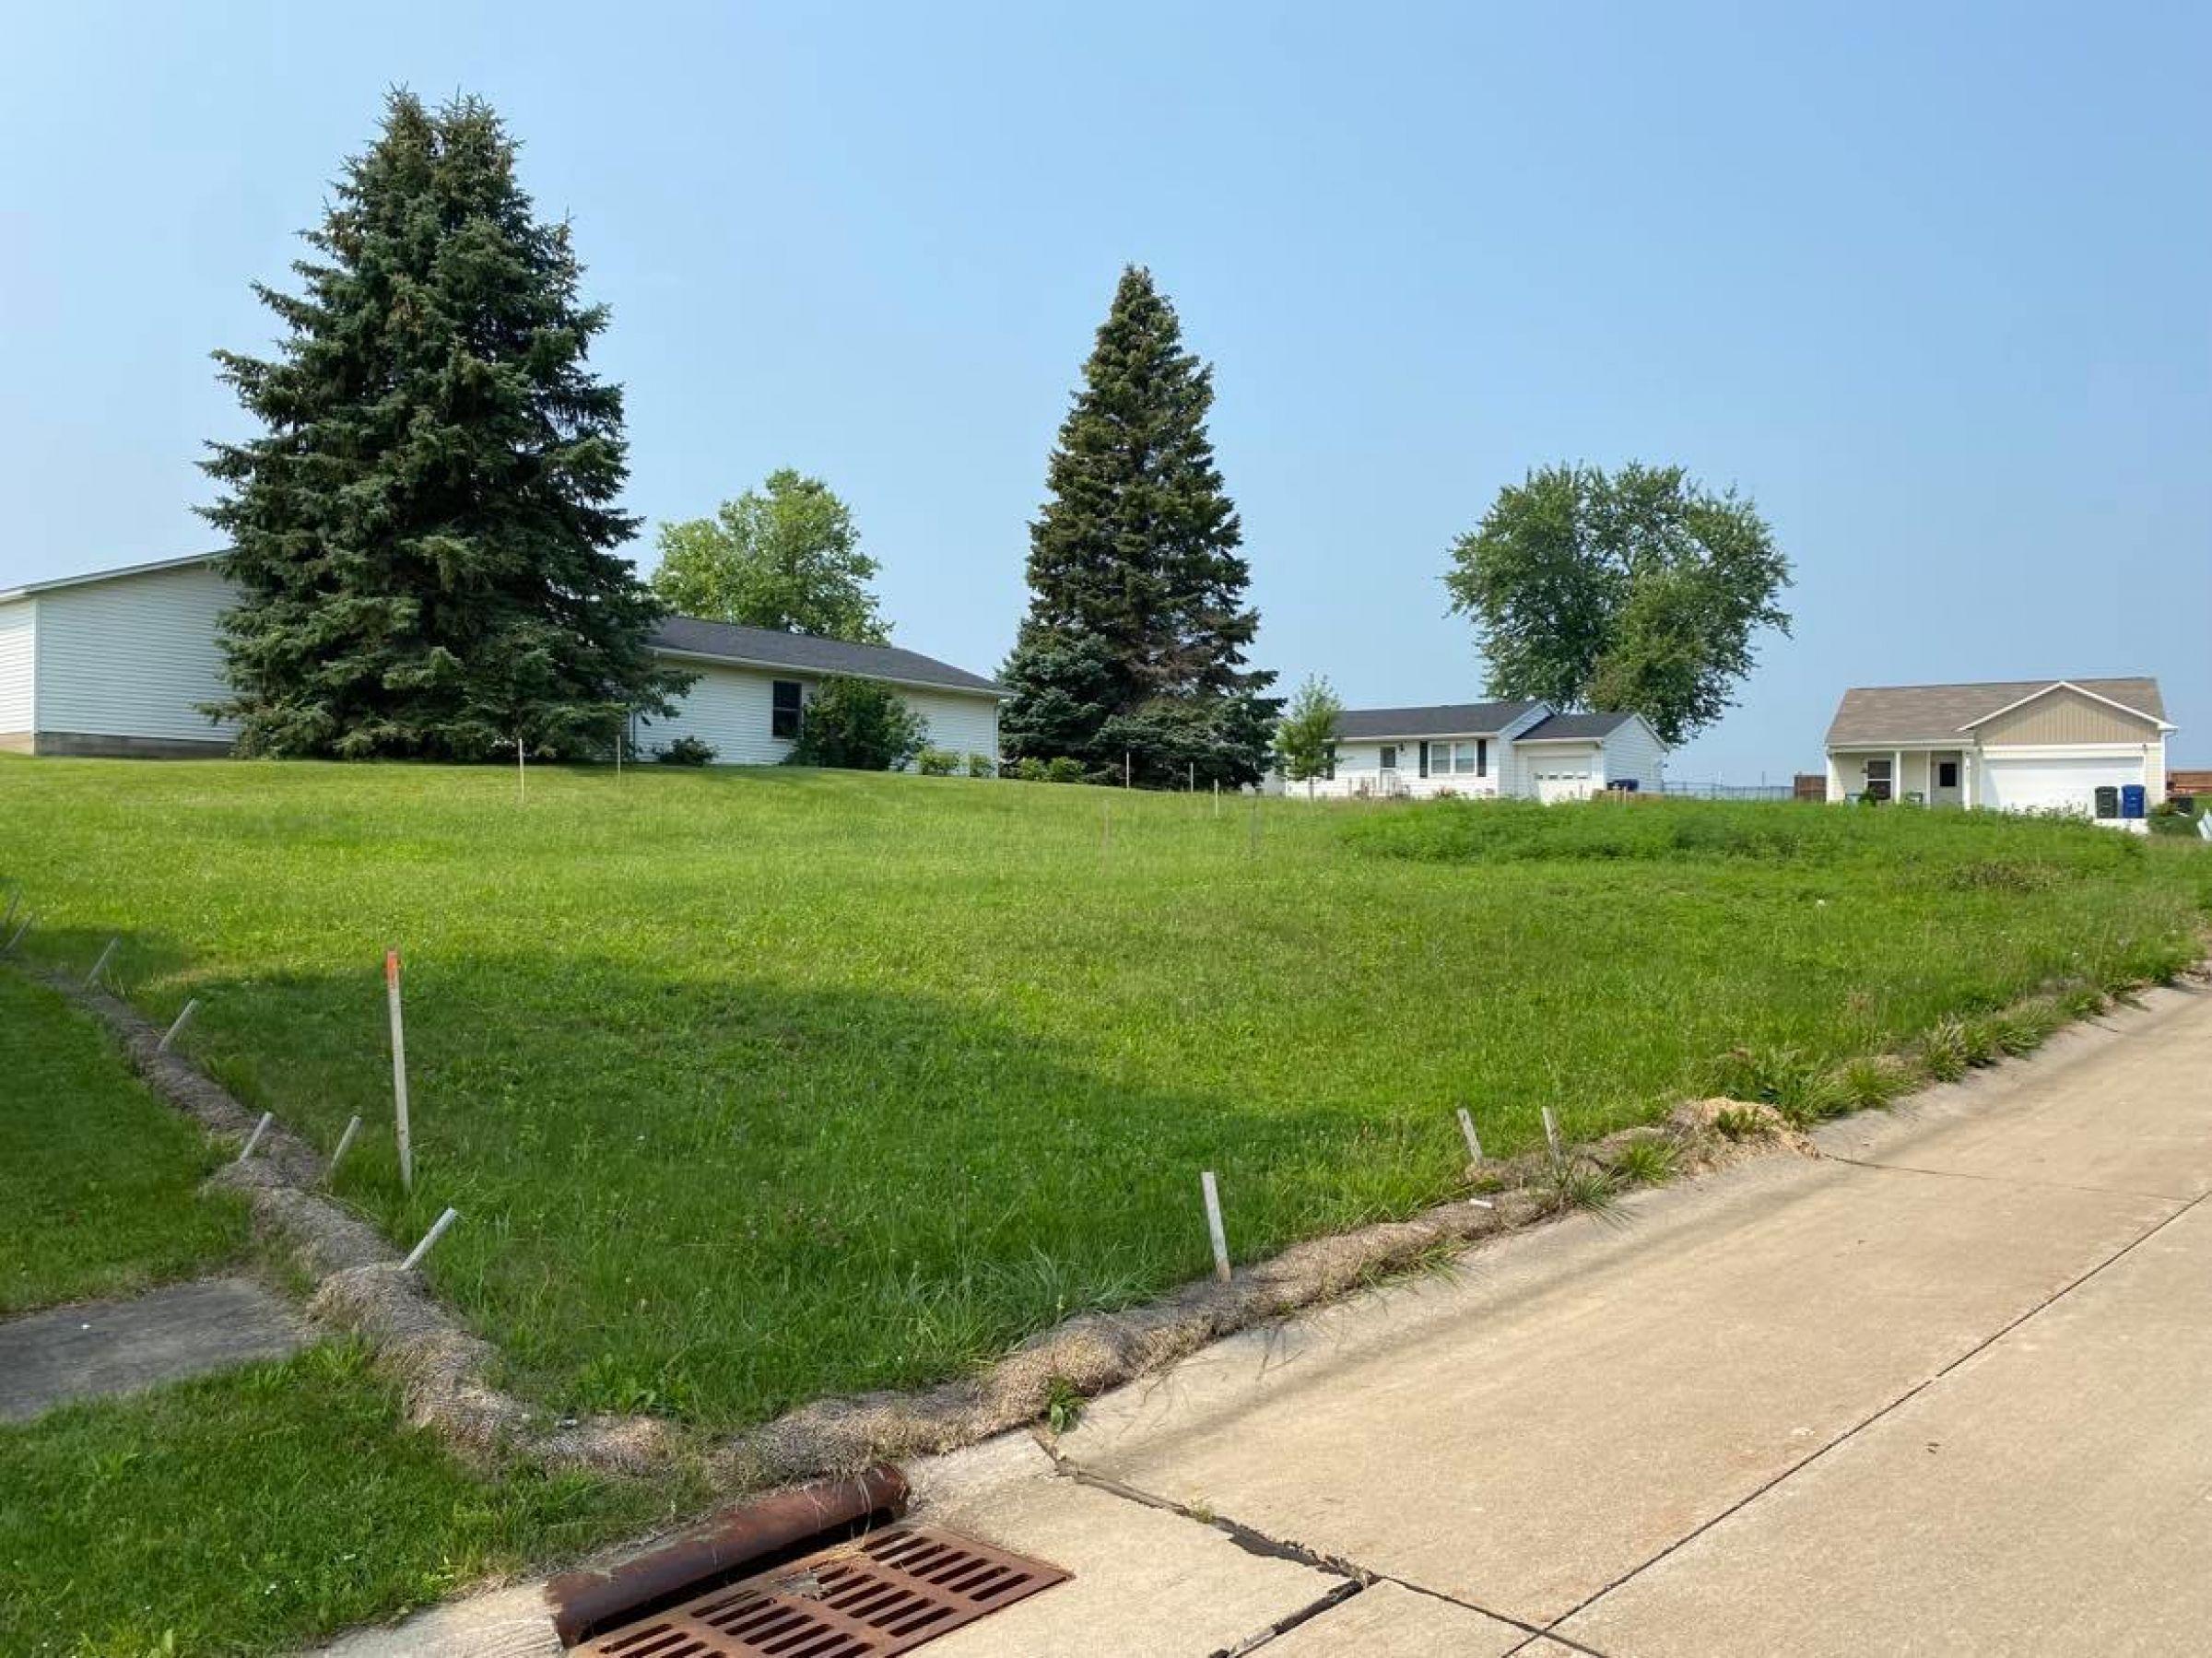 development-land-scott-county-iowa-0-acres-listing-number-15767-4-2021-09-22-040116.jpg